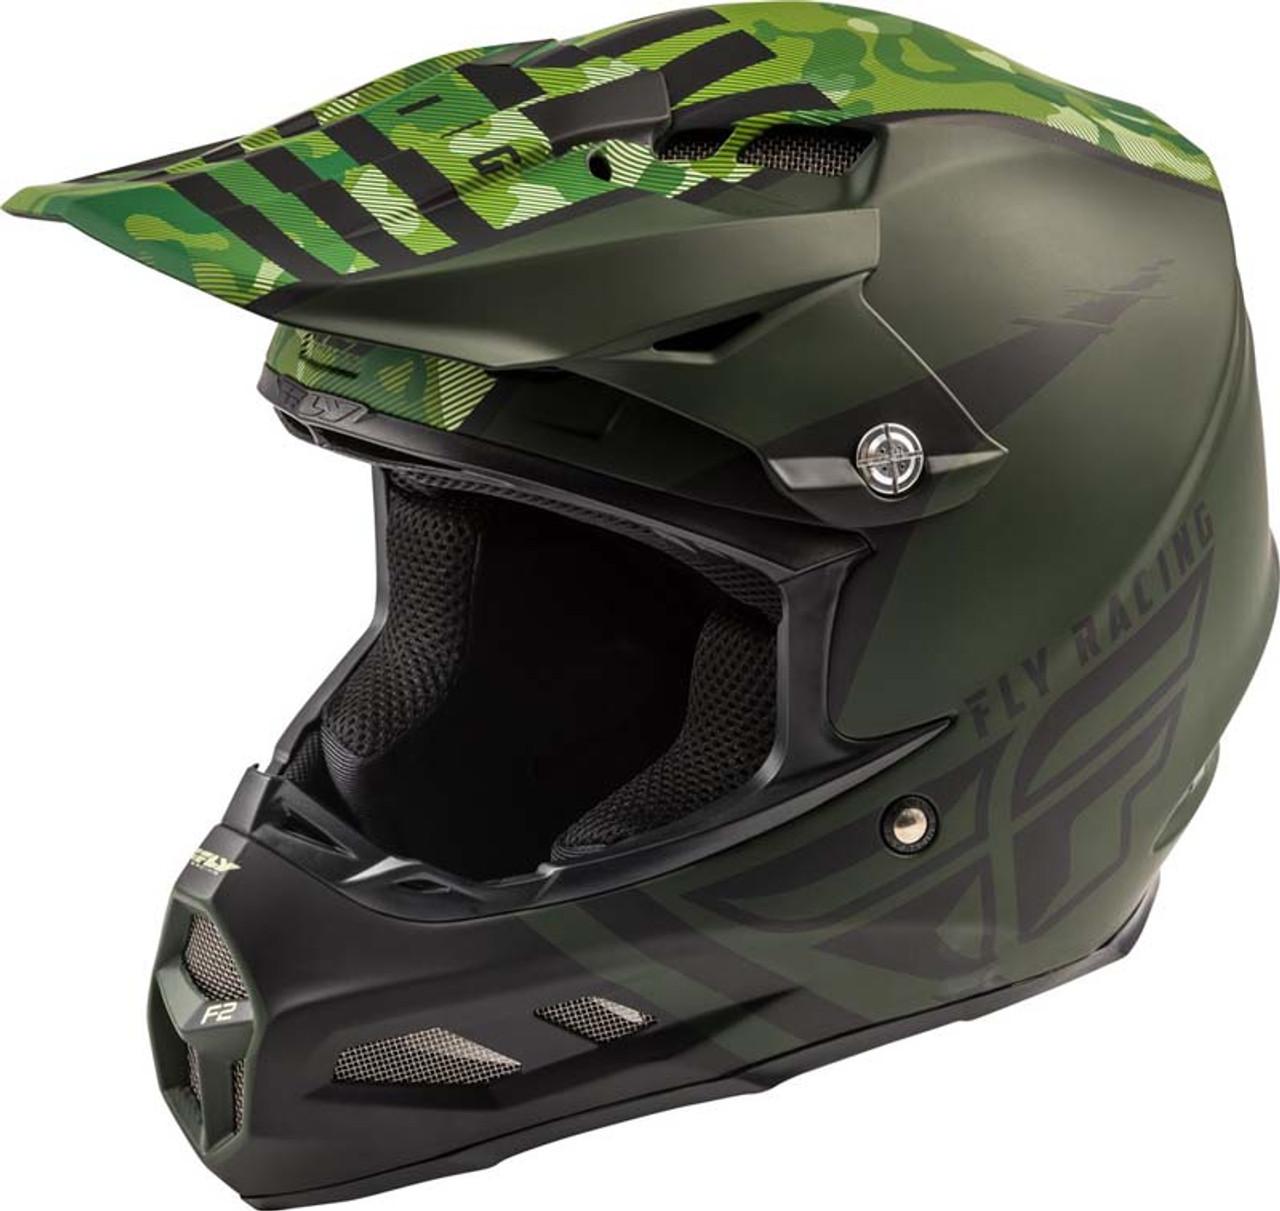 Fly Racing Visor for F2 Carbon and Formula Helmet  White